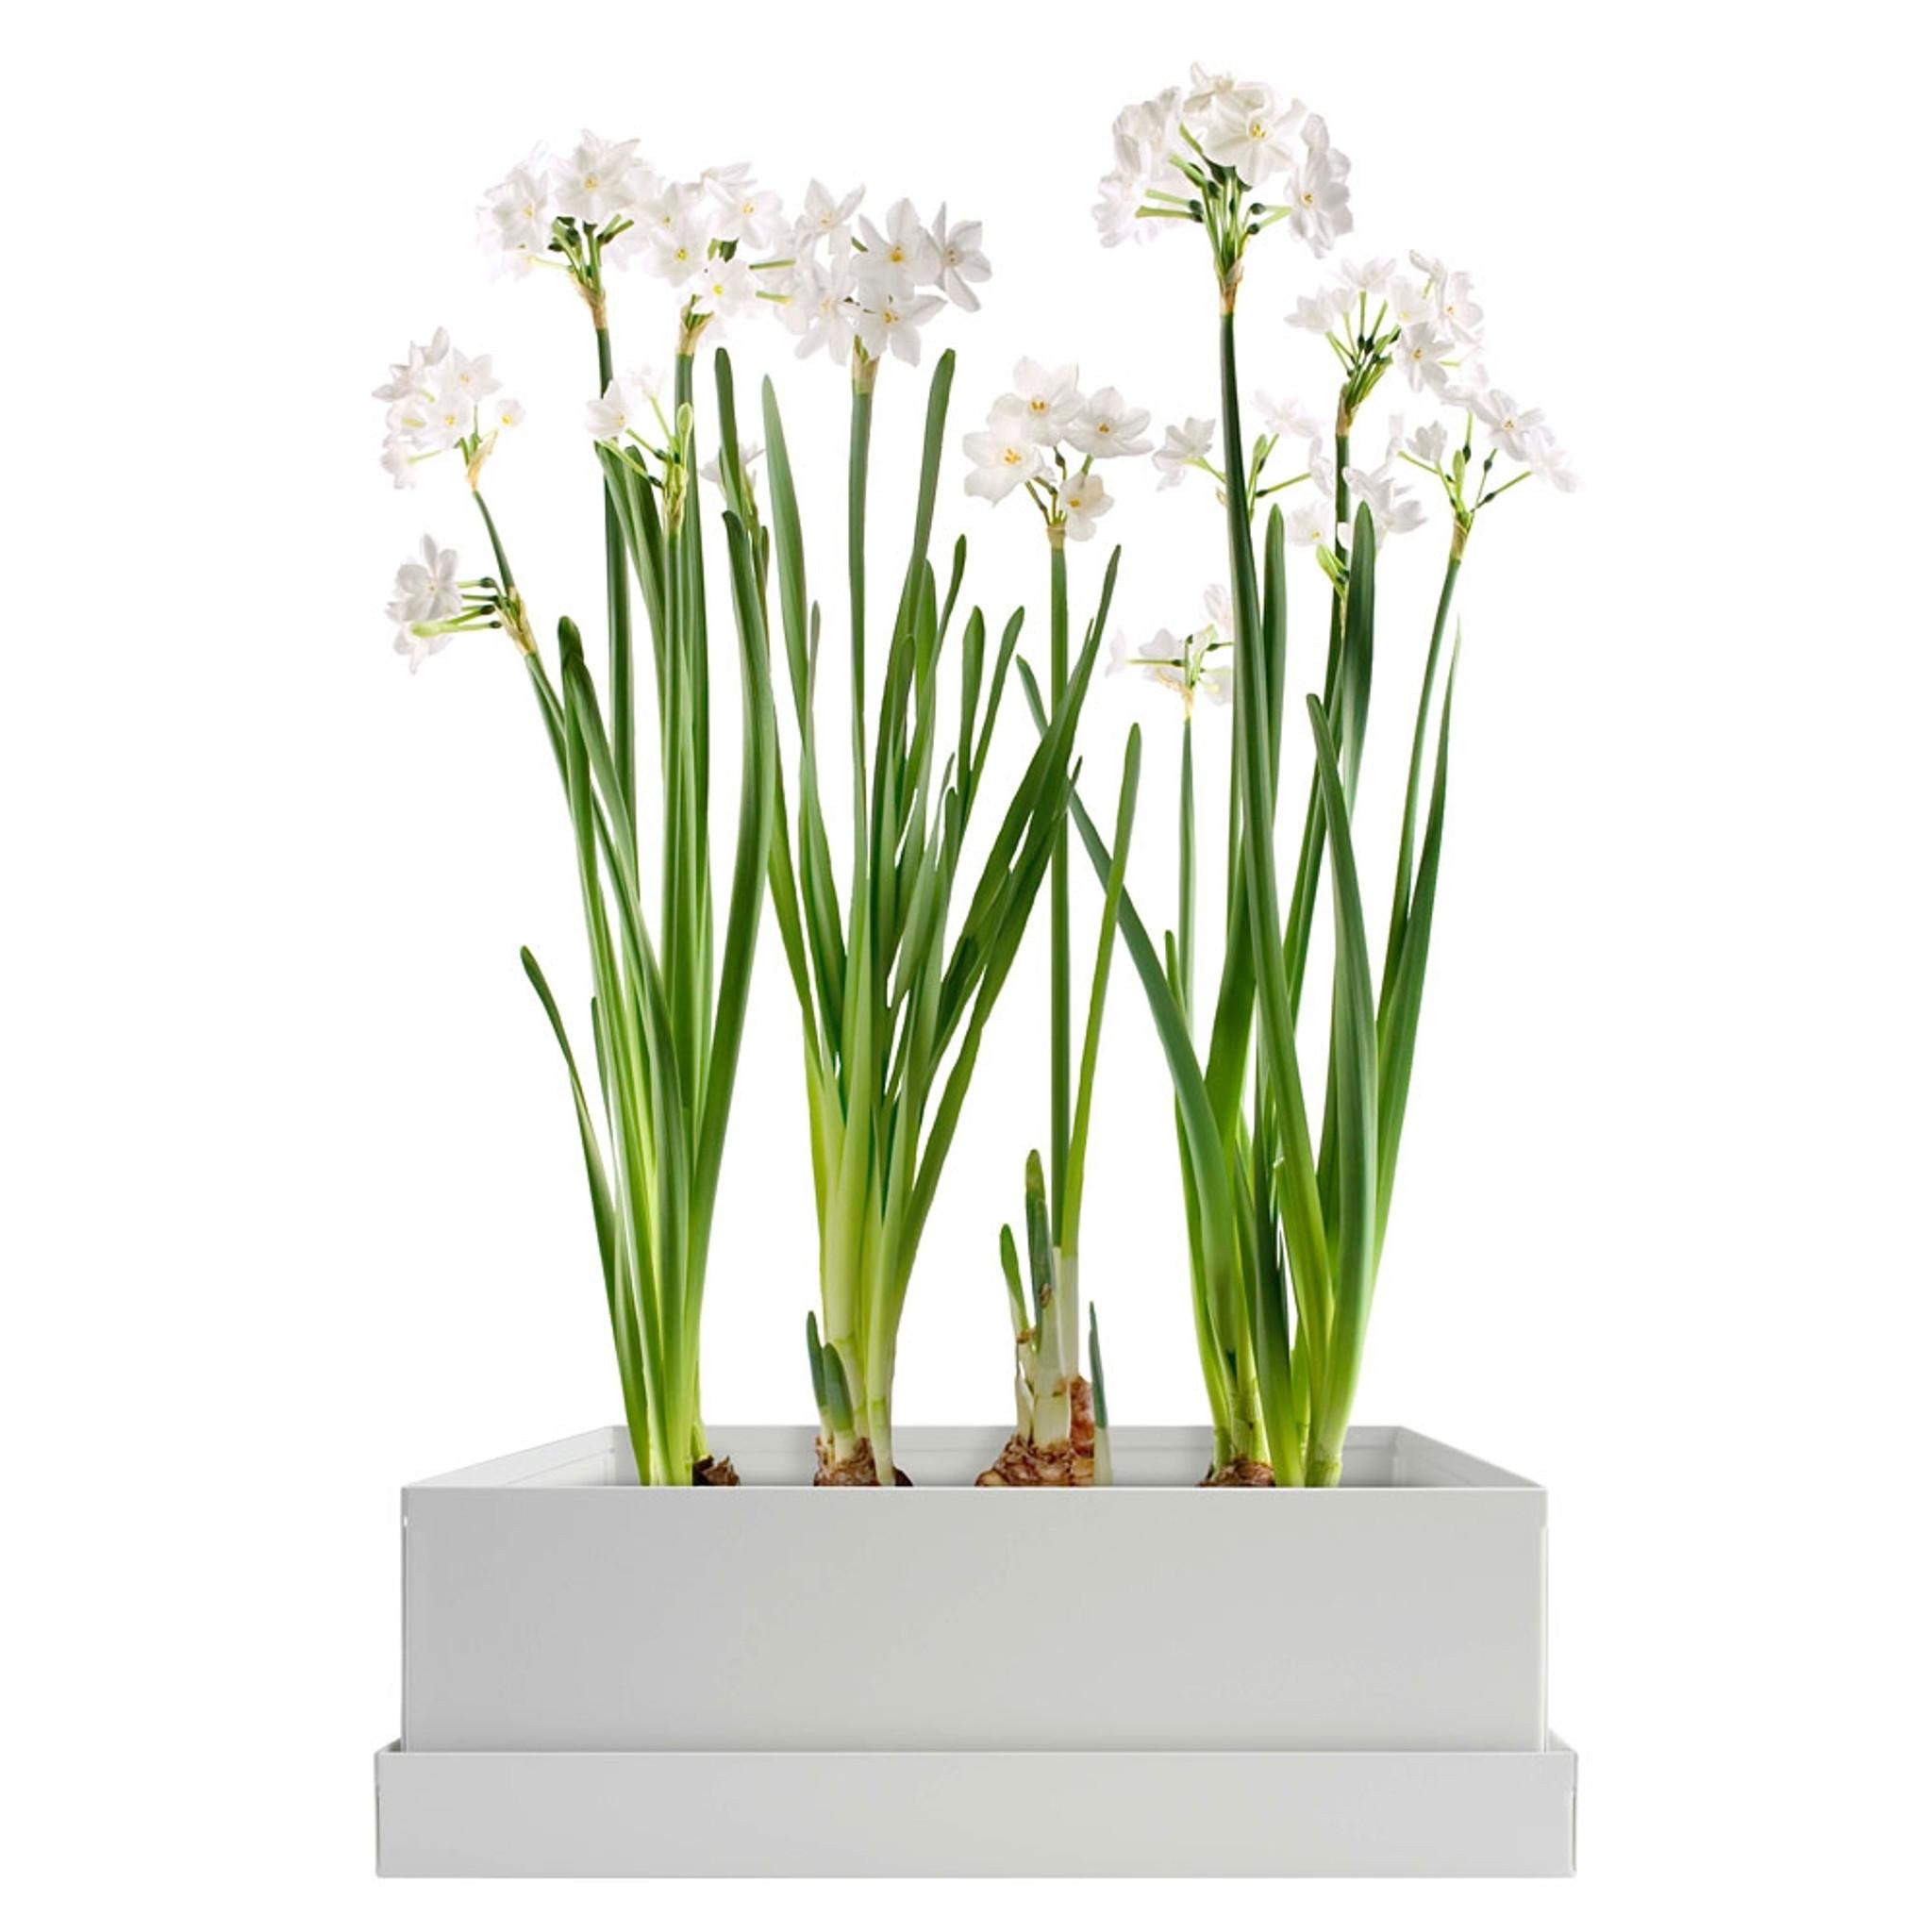 Paperwhites Bulb Box Eartheasy